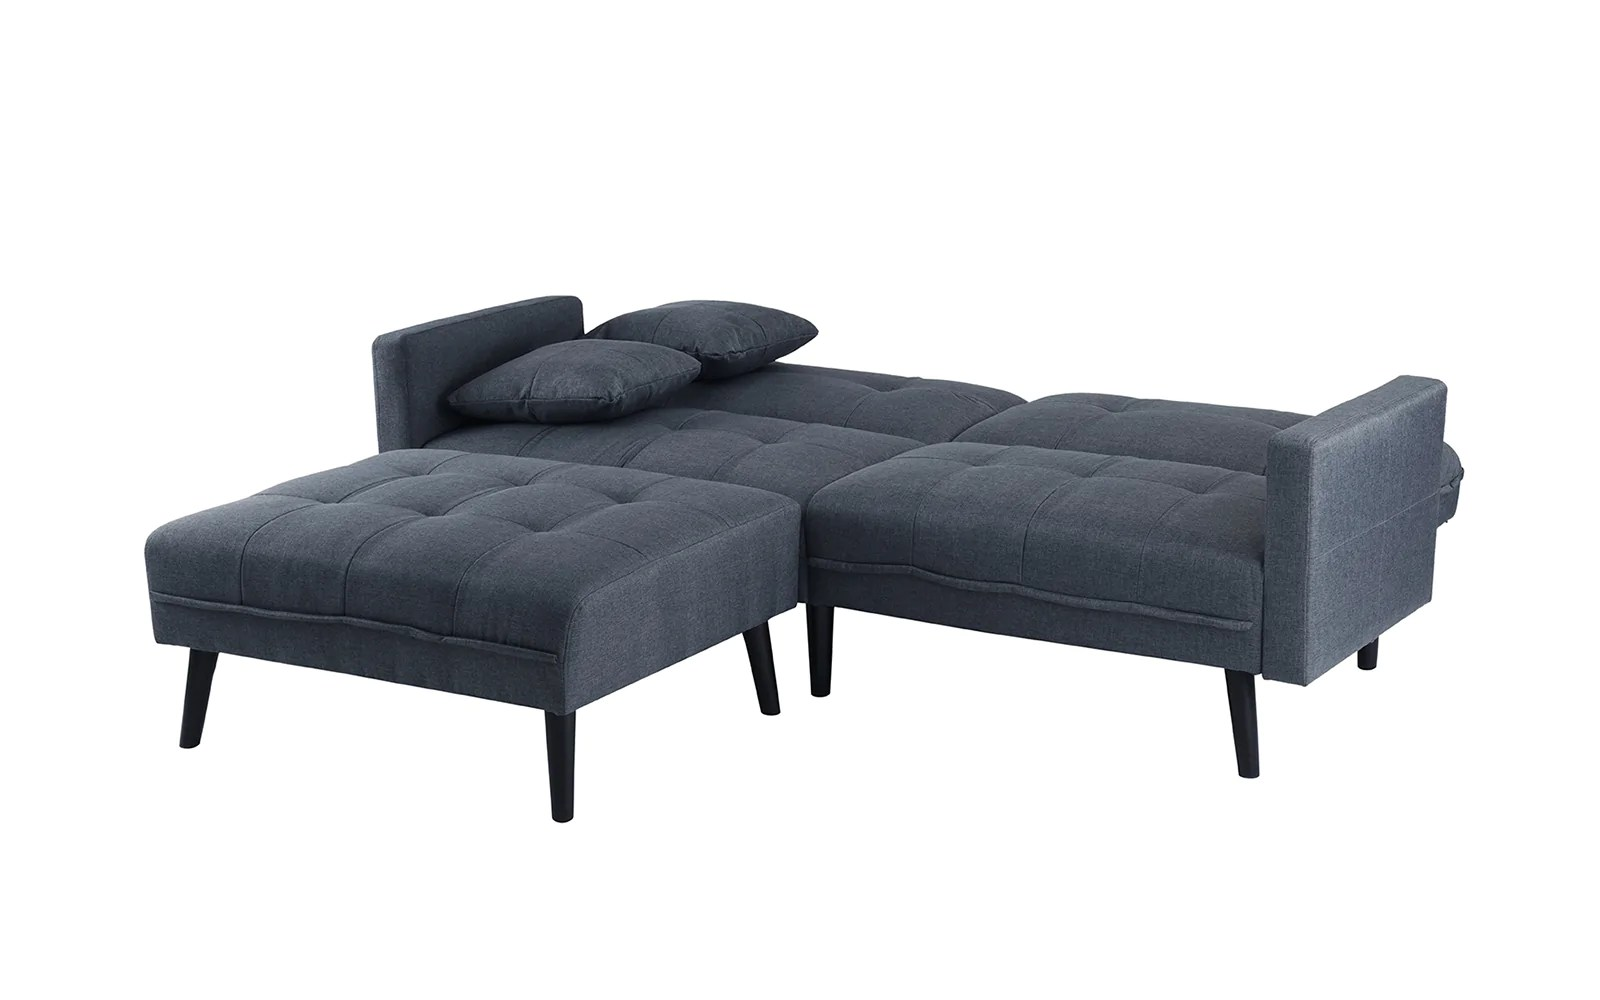 berwick mid century sleeper sofa curved sectional with ottoman madison linen sofamania